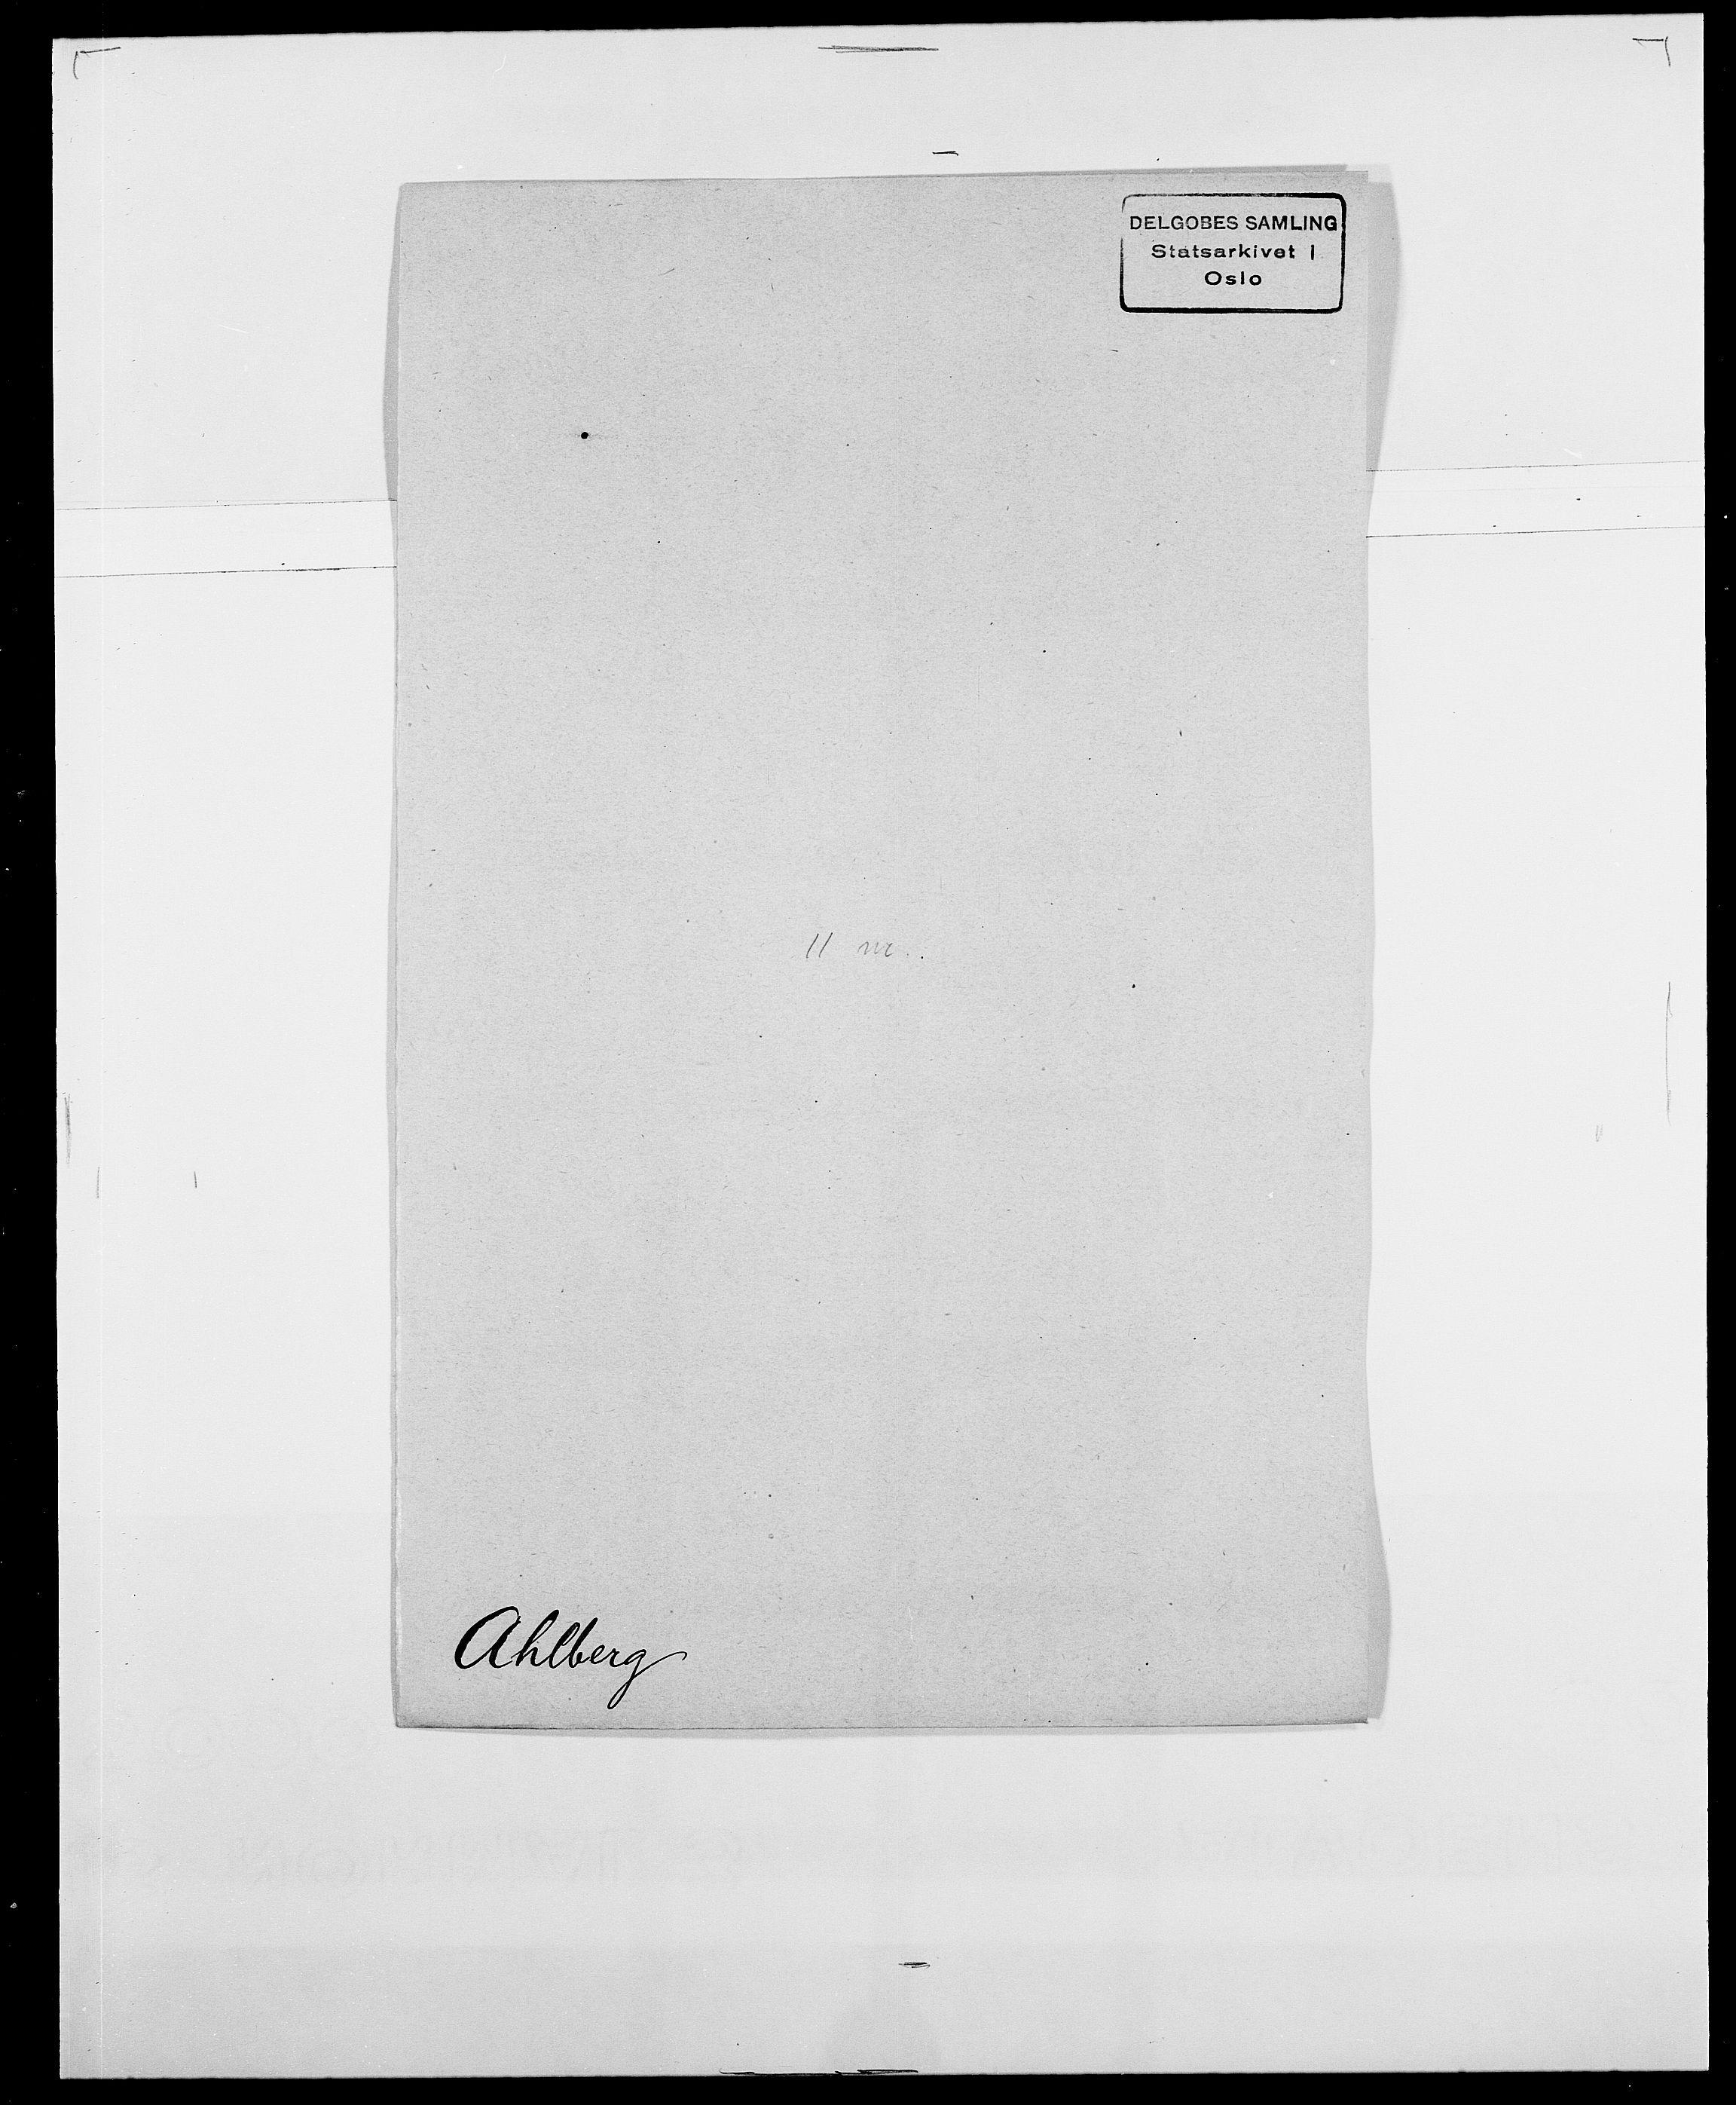 SAO, Delgobe, Charles Antoine - samling, D/Da/L0001: Aabye - Angerman, s. 314